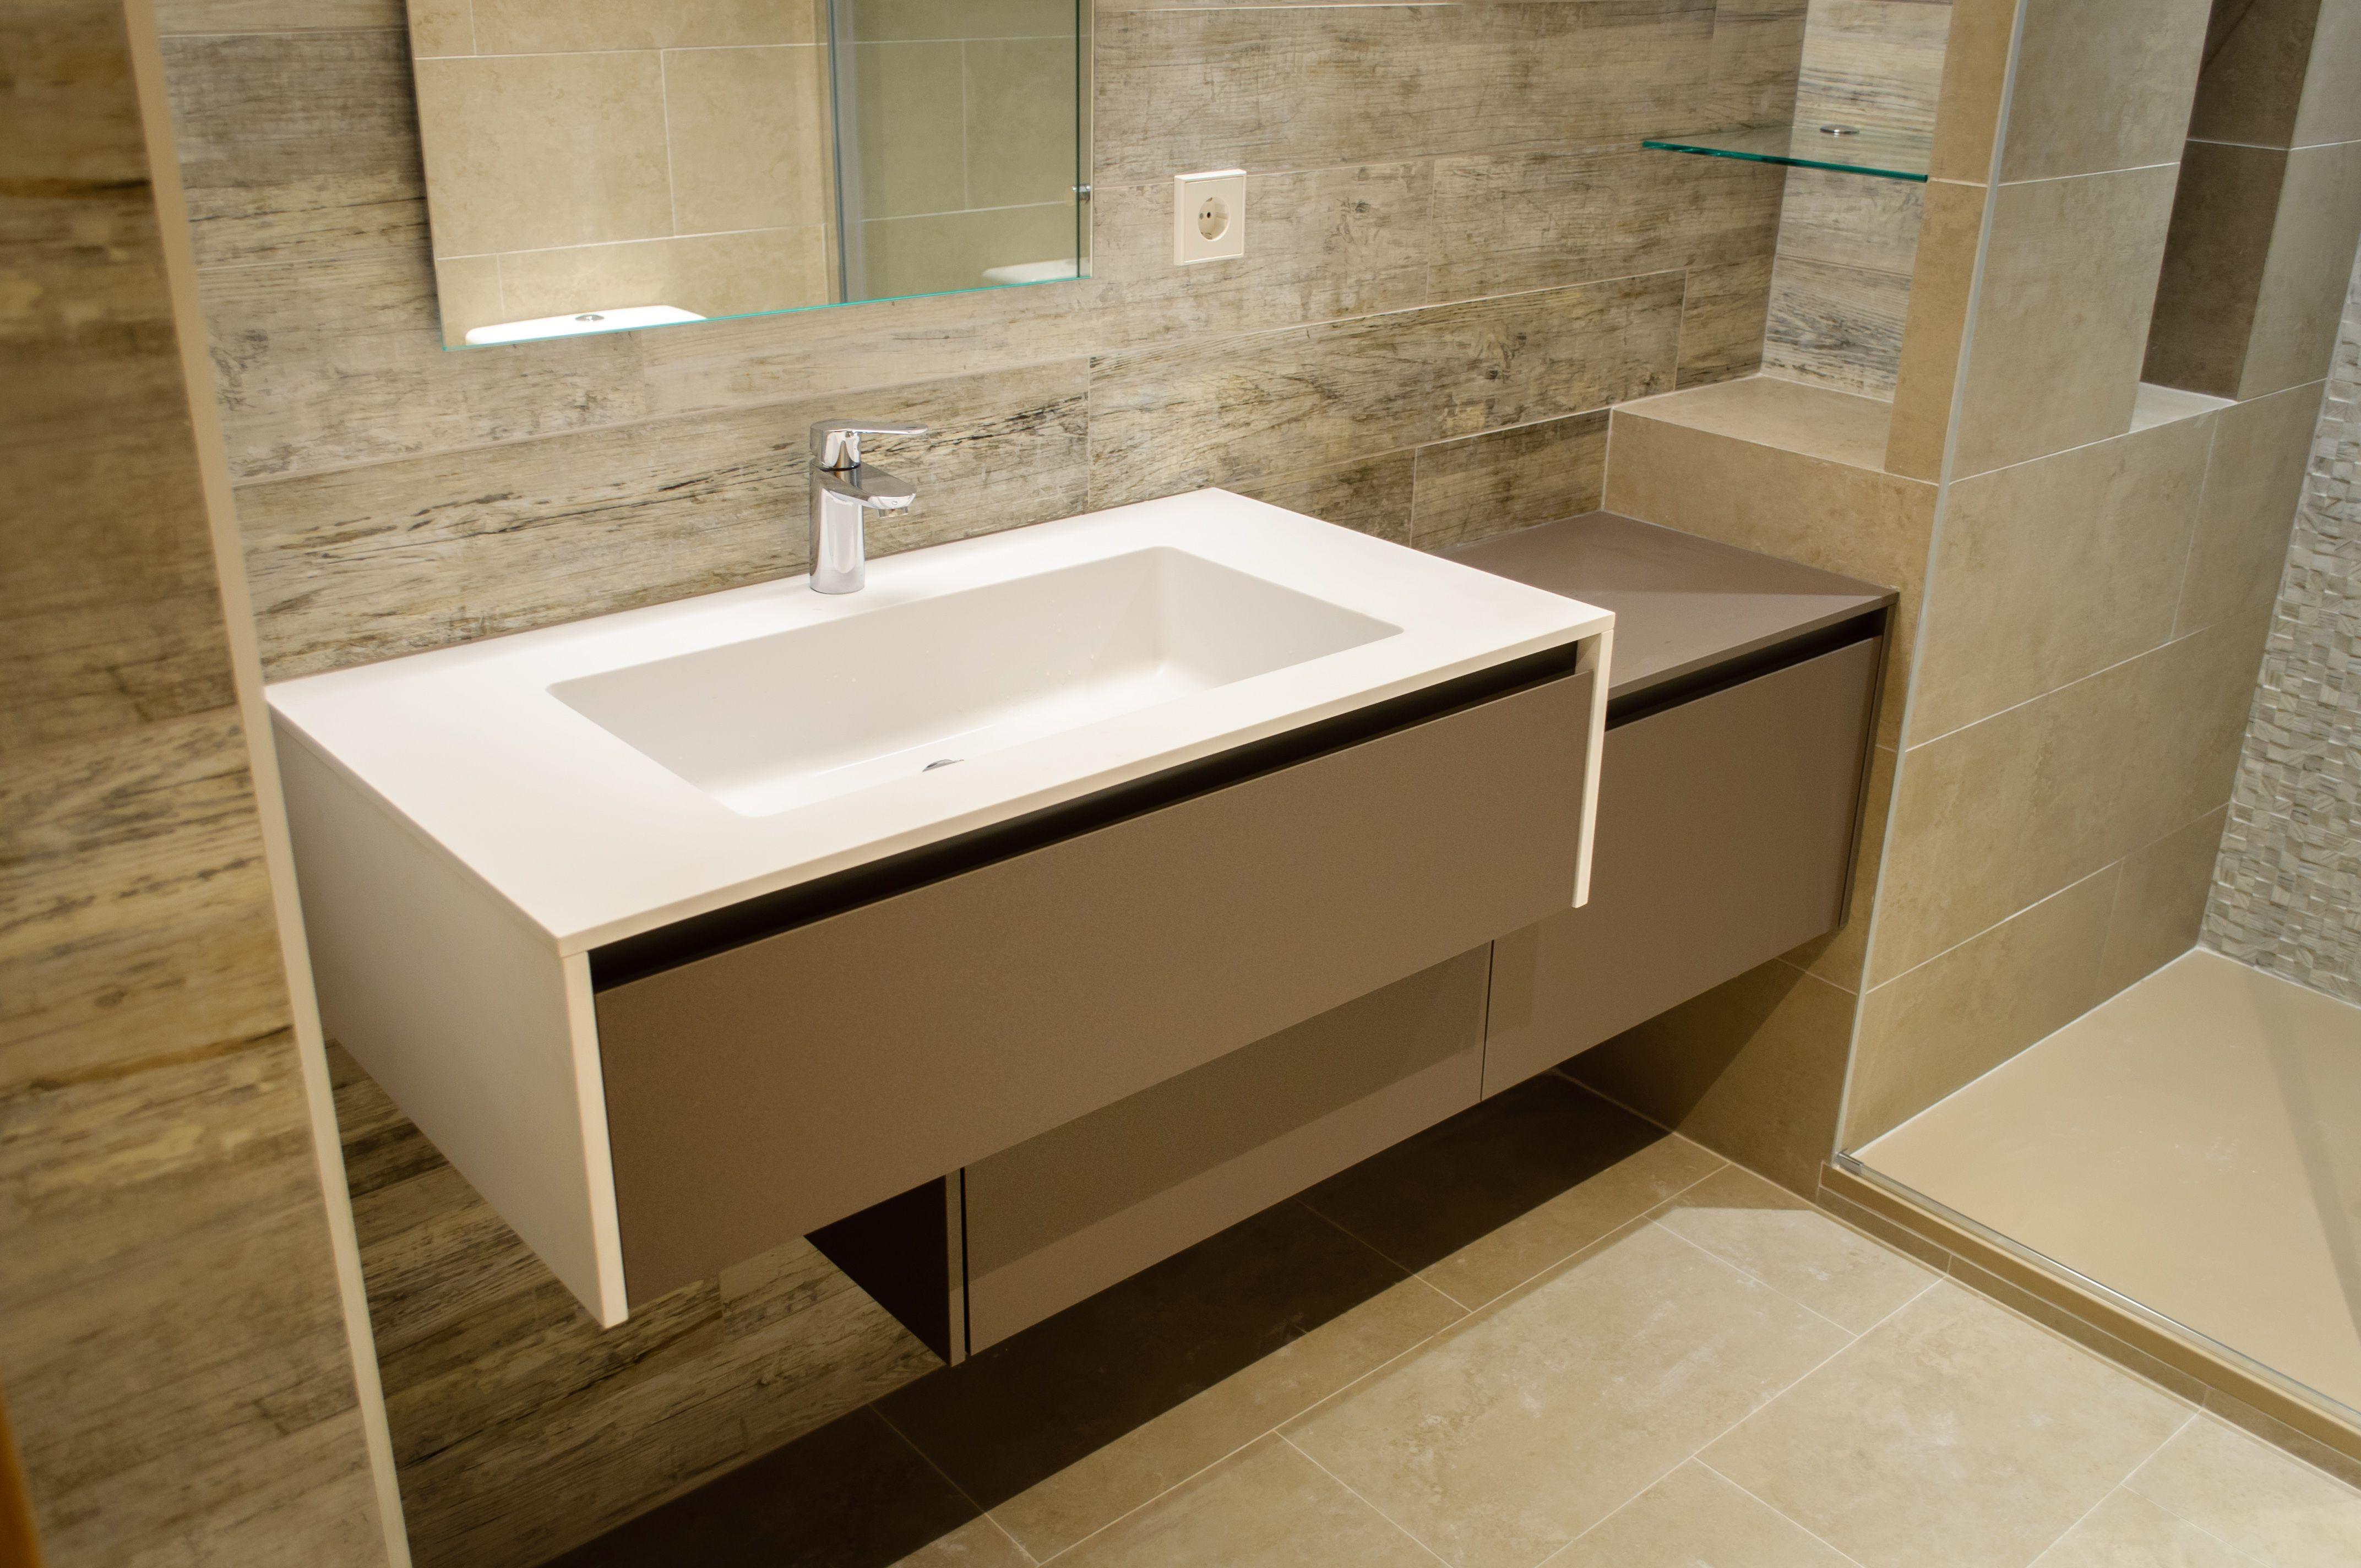 Mueble baño modelo WELLNESS, laminado Fenix. Encimera de ...